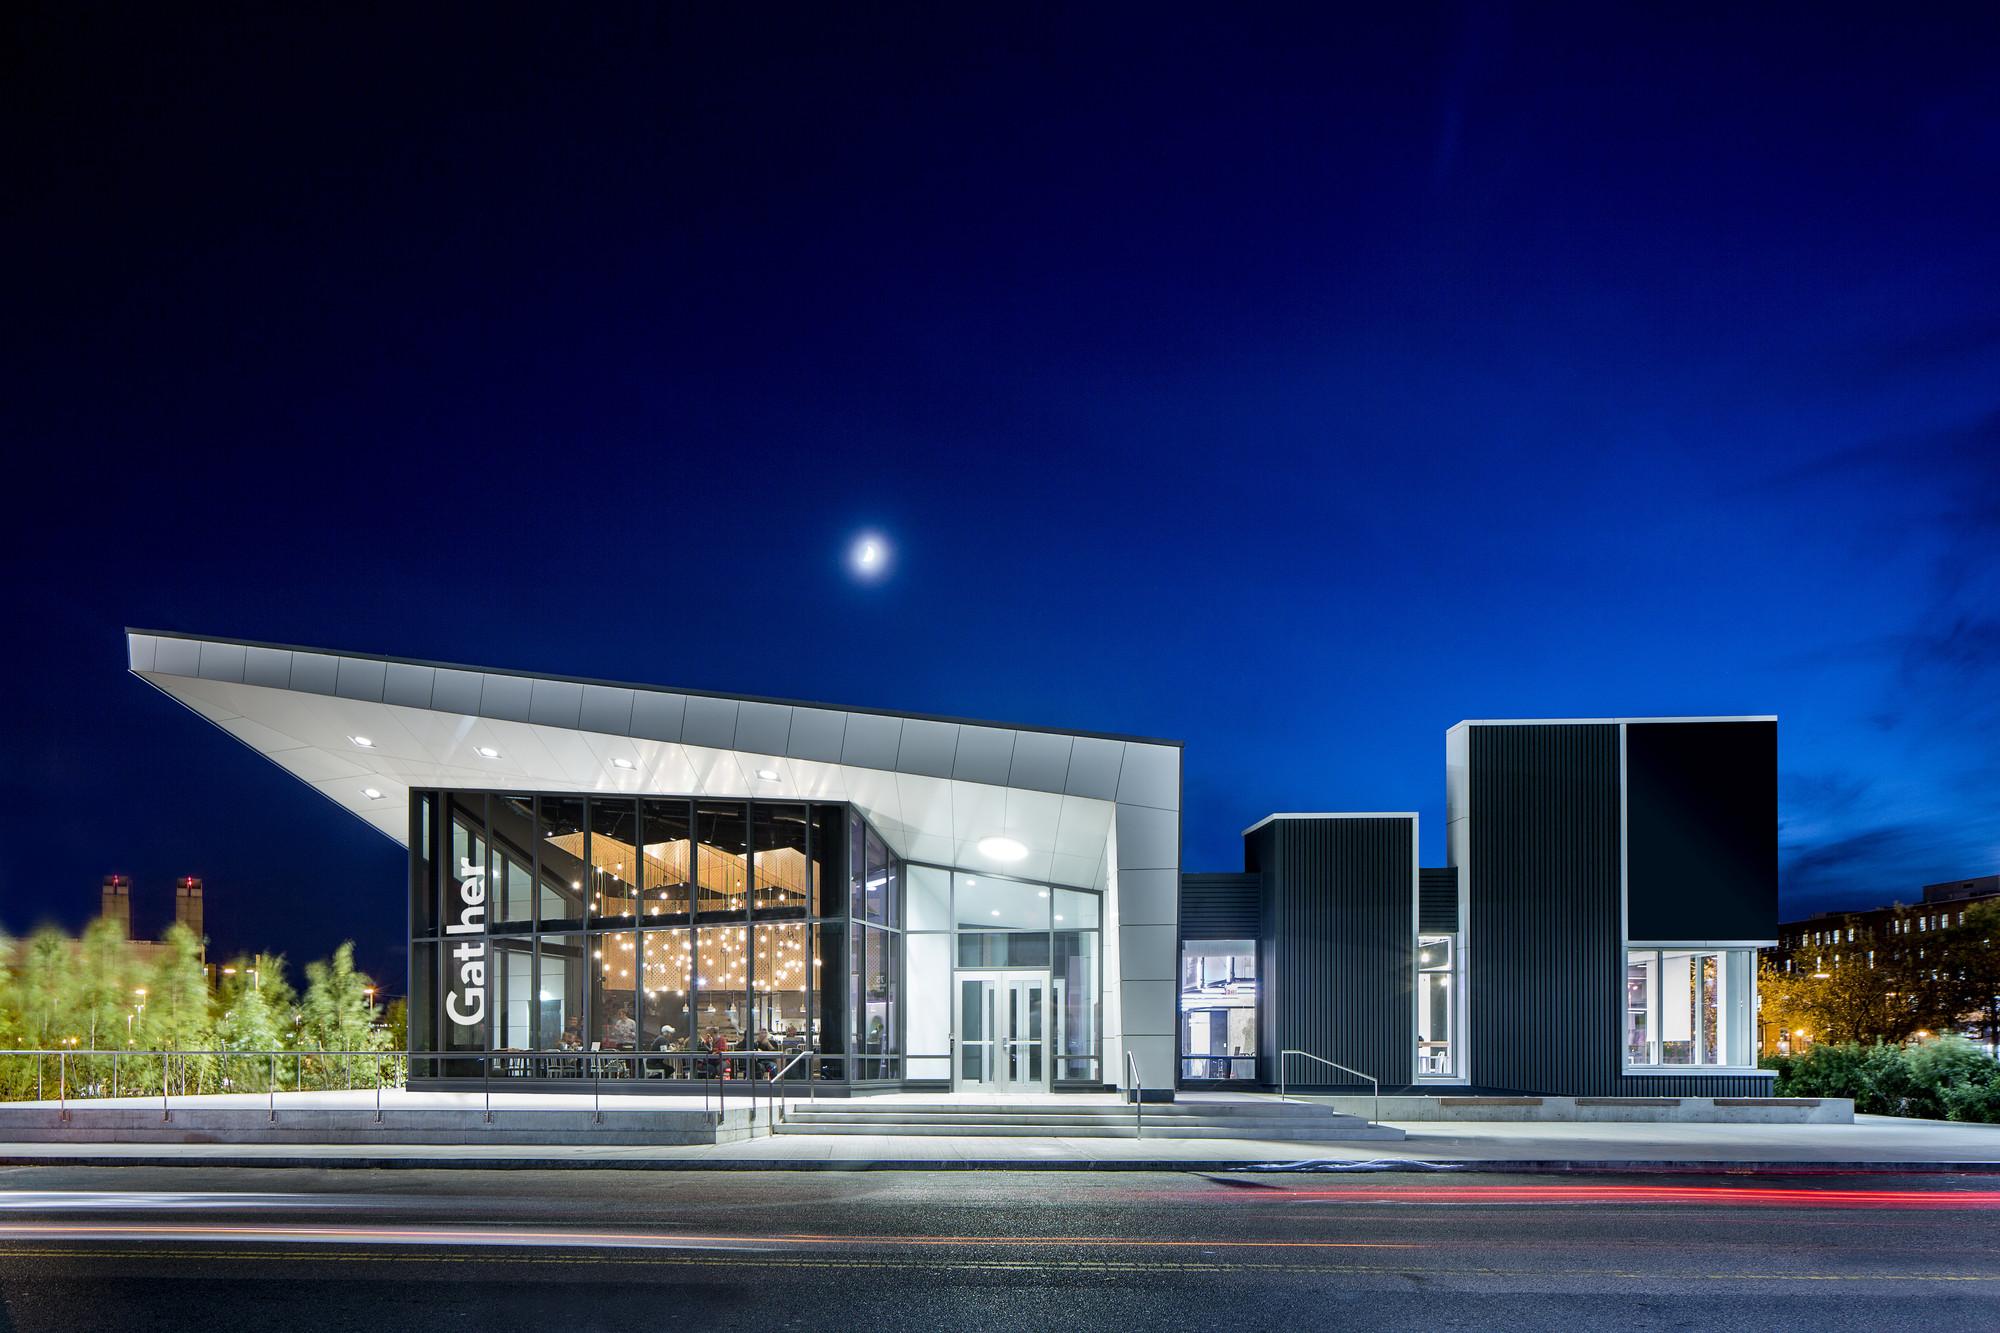 District Hall, Boston's Public Innovation Center / Hacin + Associates, © Gustav Hoiland, Flagship Photo